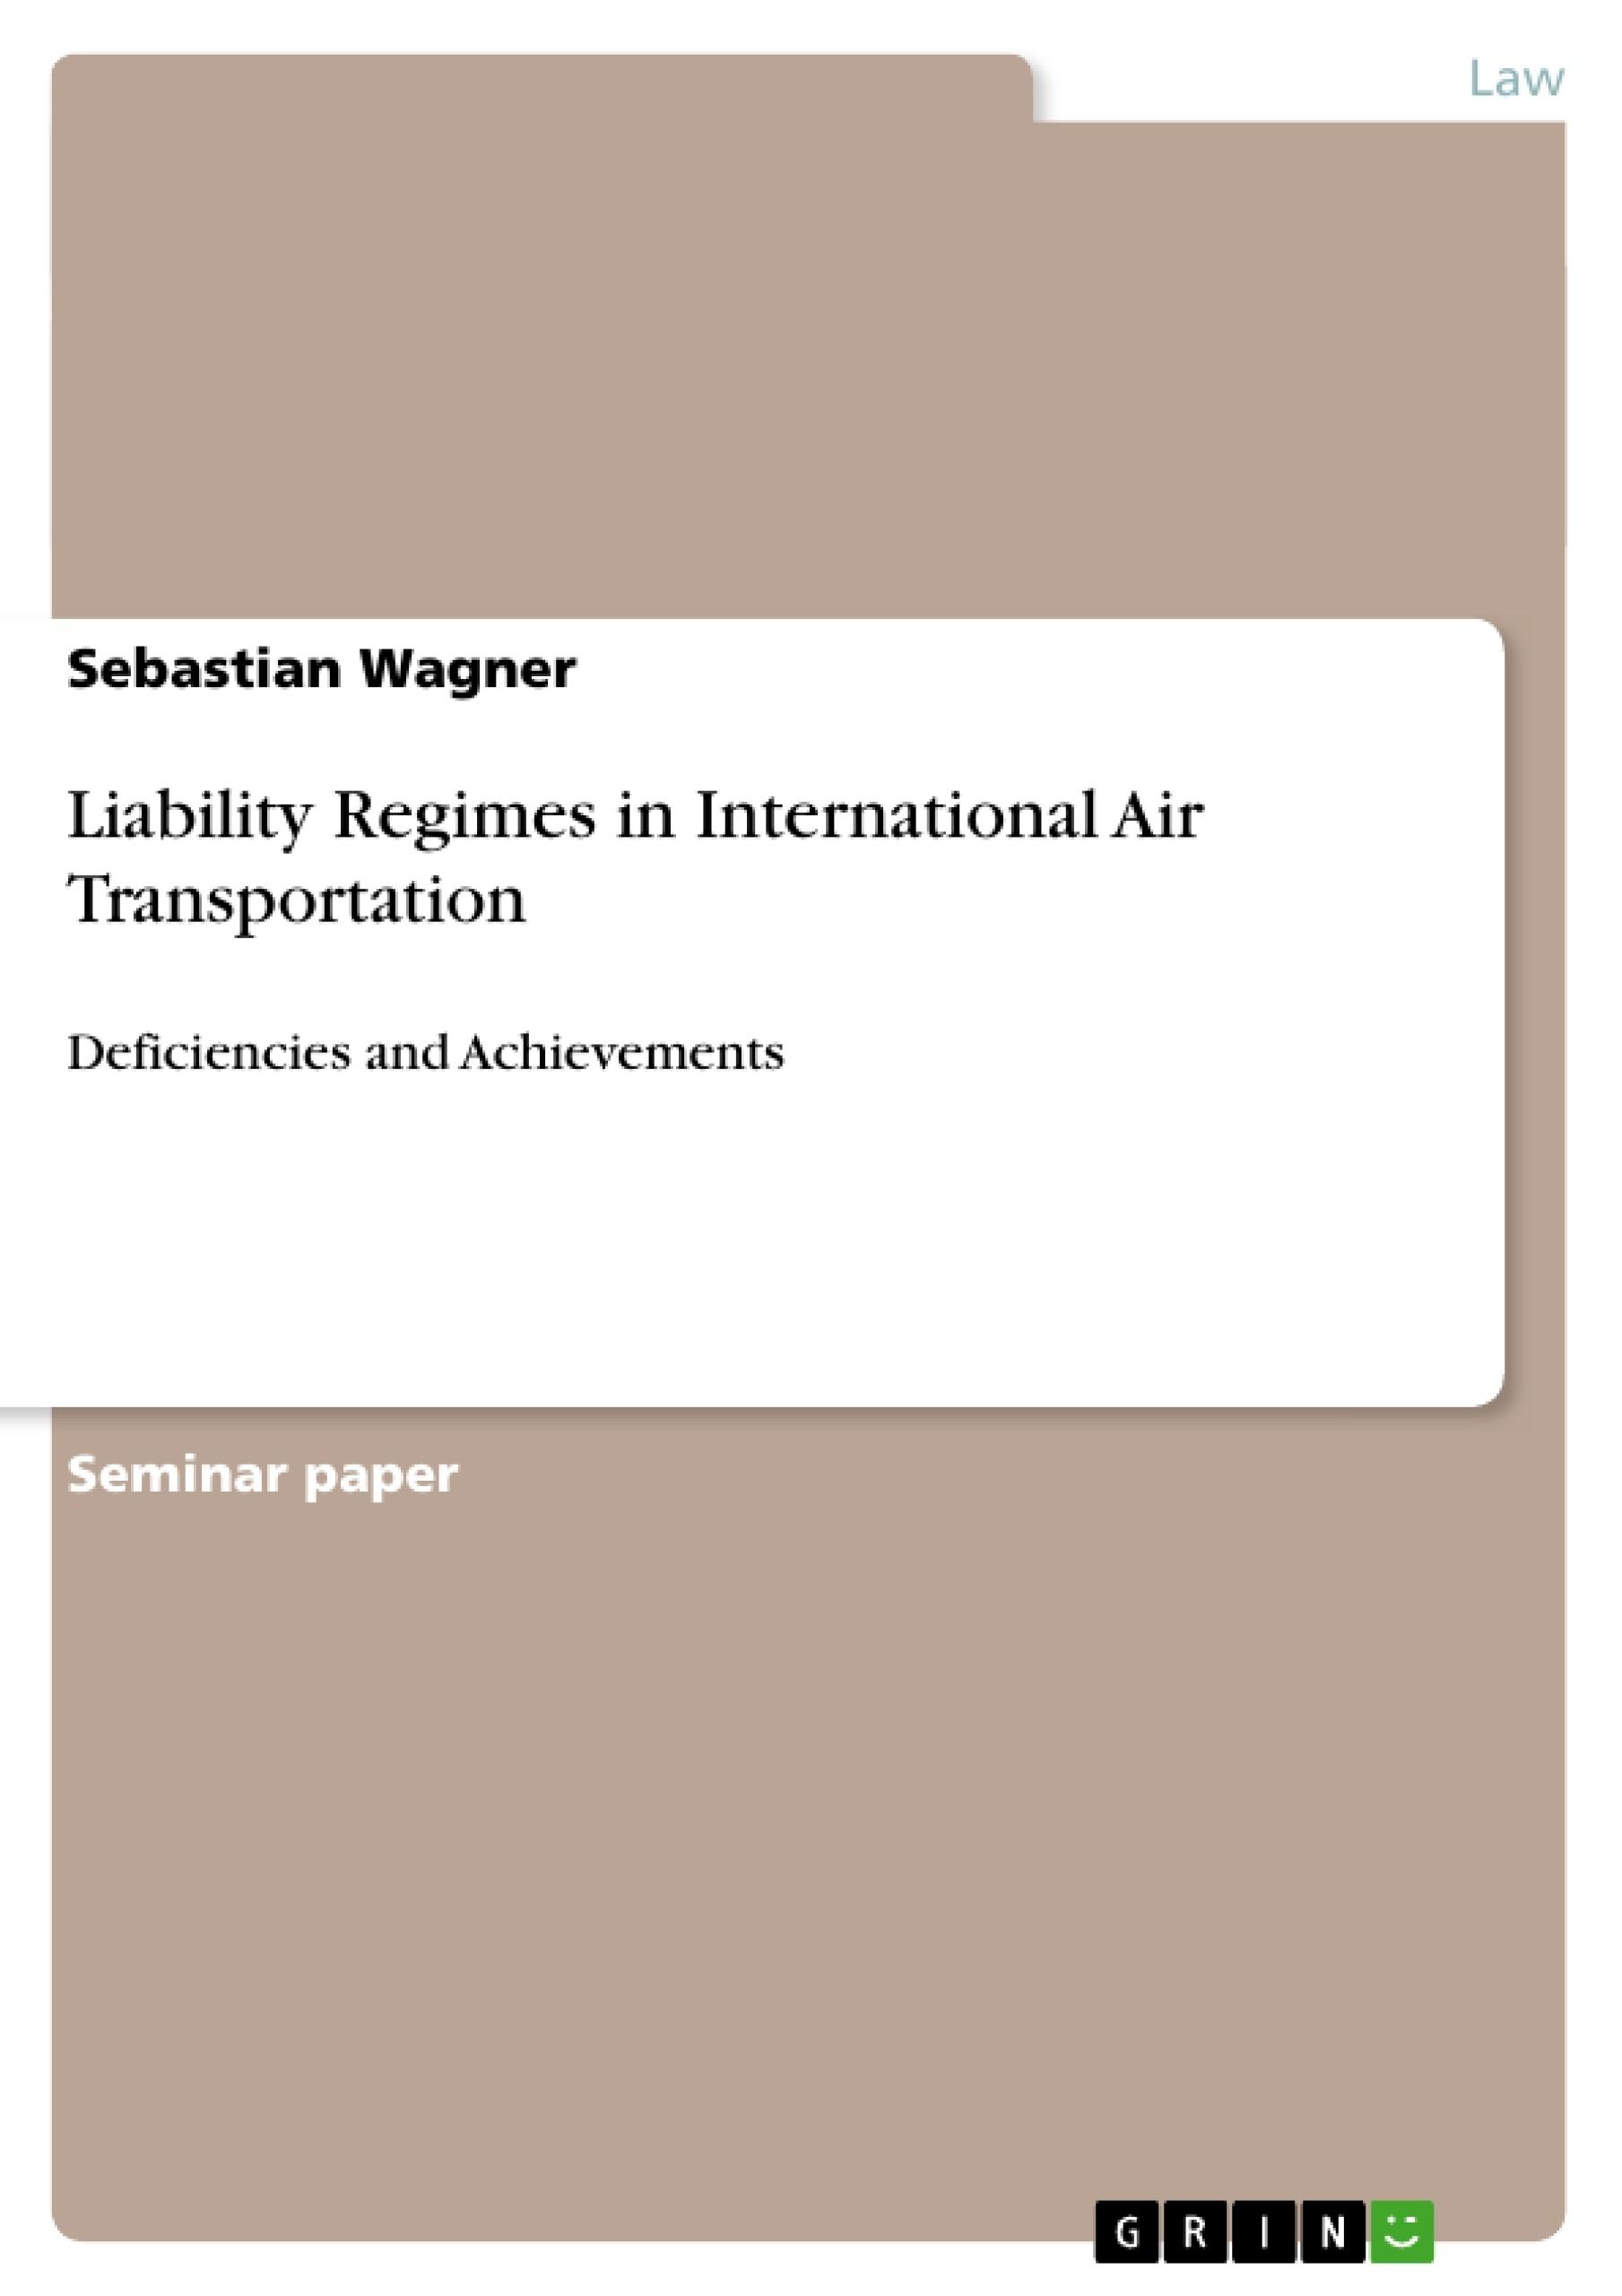 Title: Liability Regimes in International Air Transportation